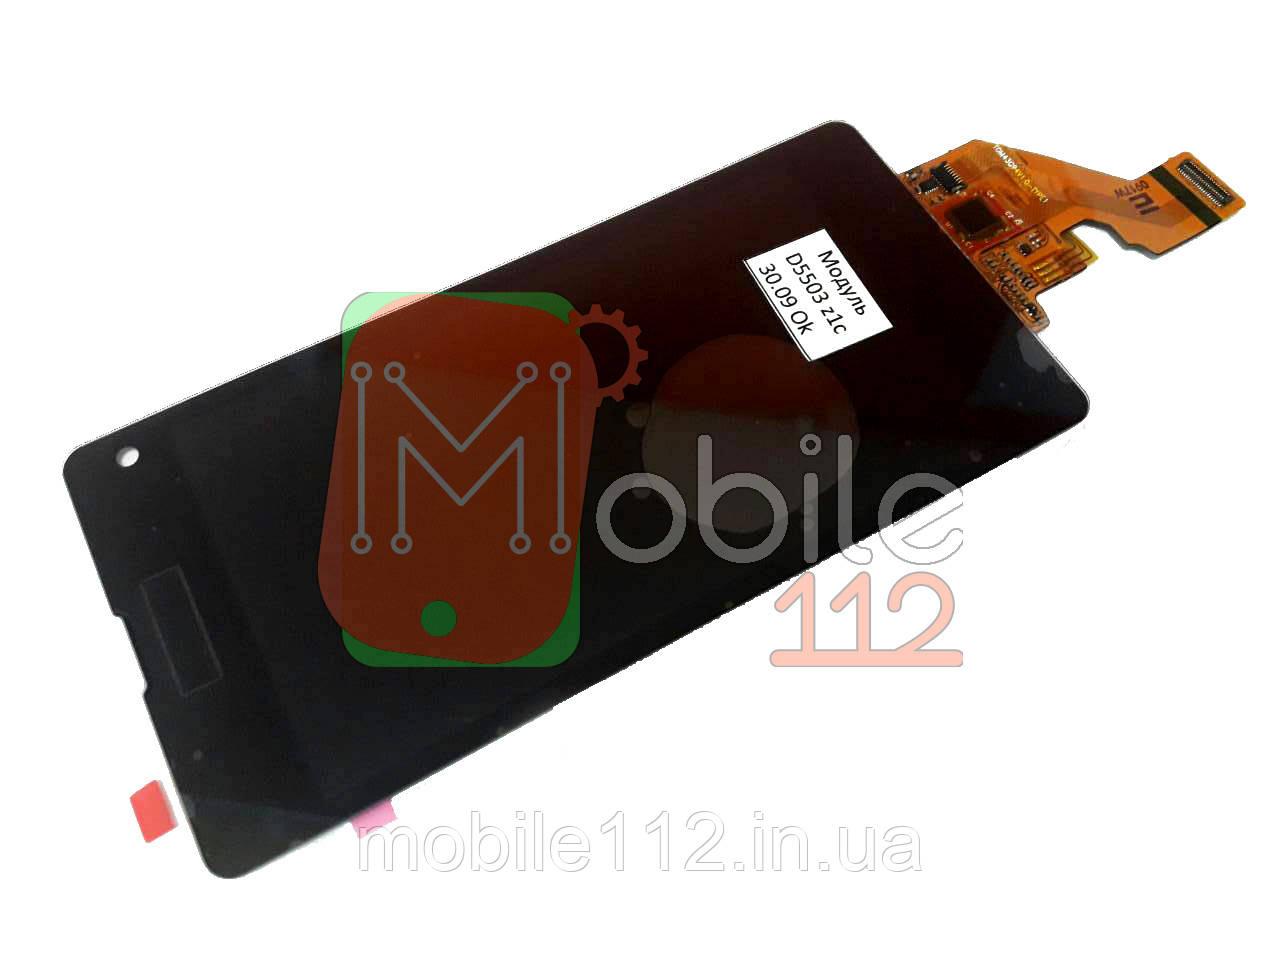 Экран (дисплей) Sony Xperia Z1 Compact D5503 + тачскрин черный